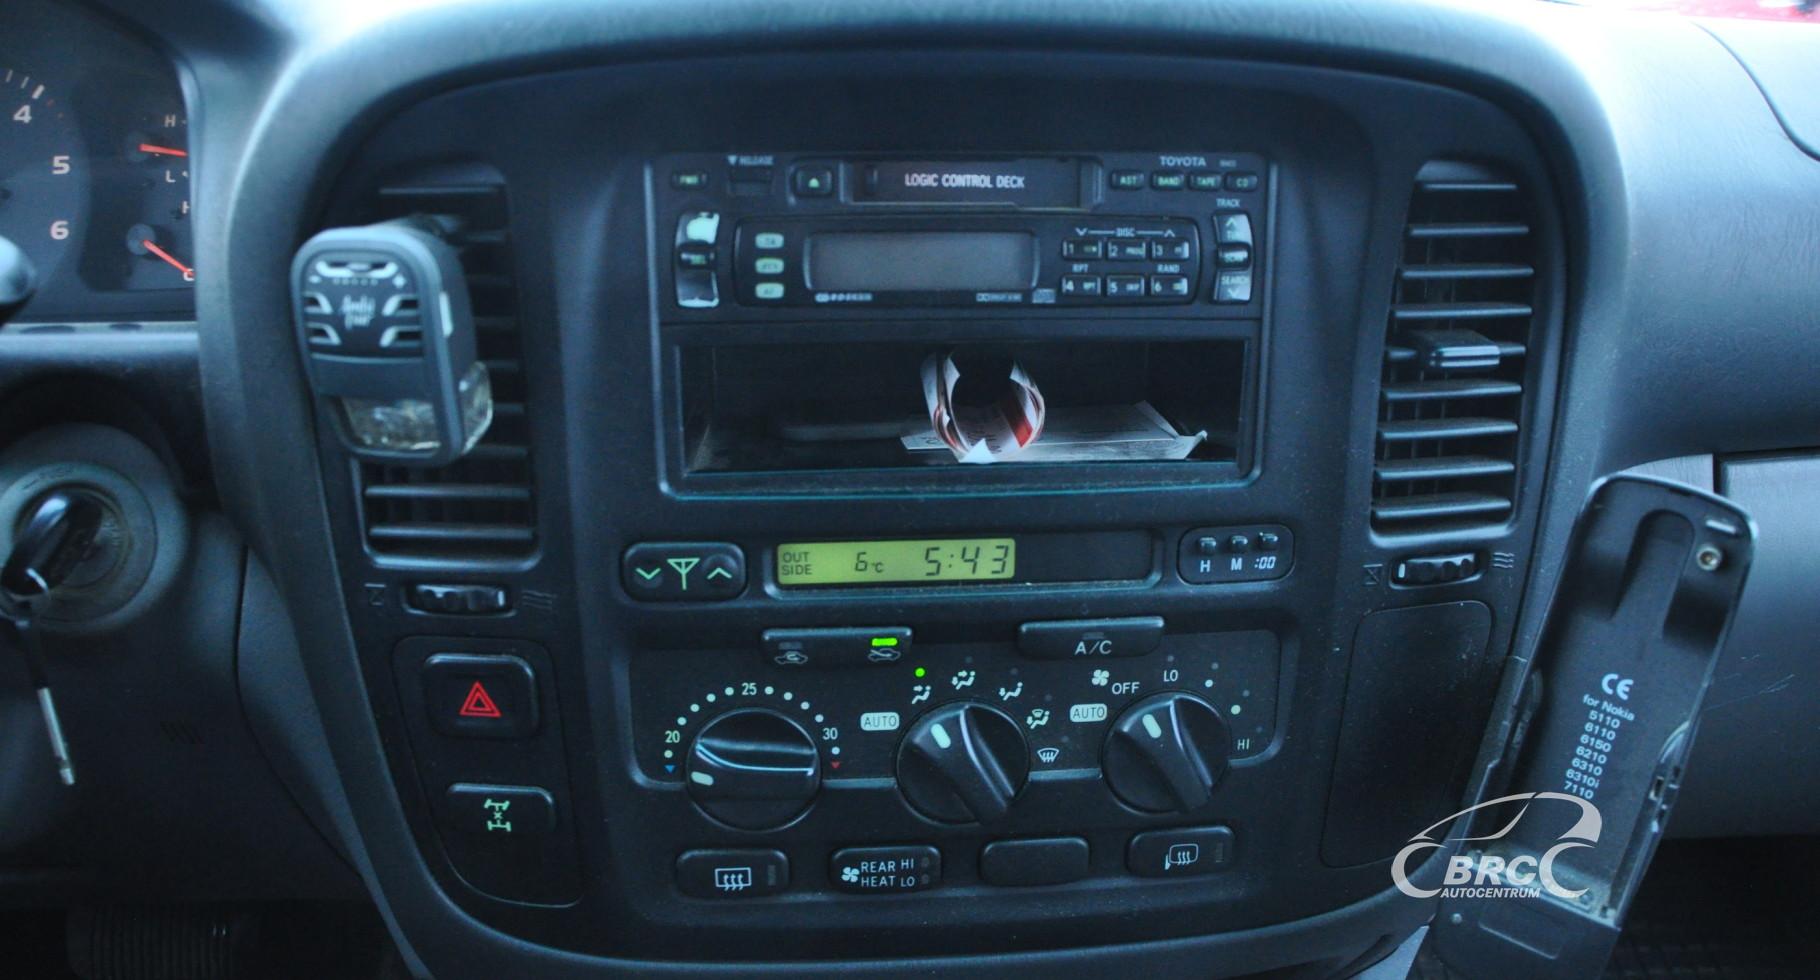 Toyota Land Cruiser 100 4.2 D-4D Automatas